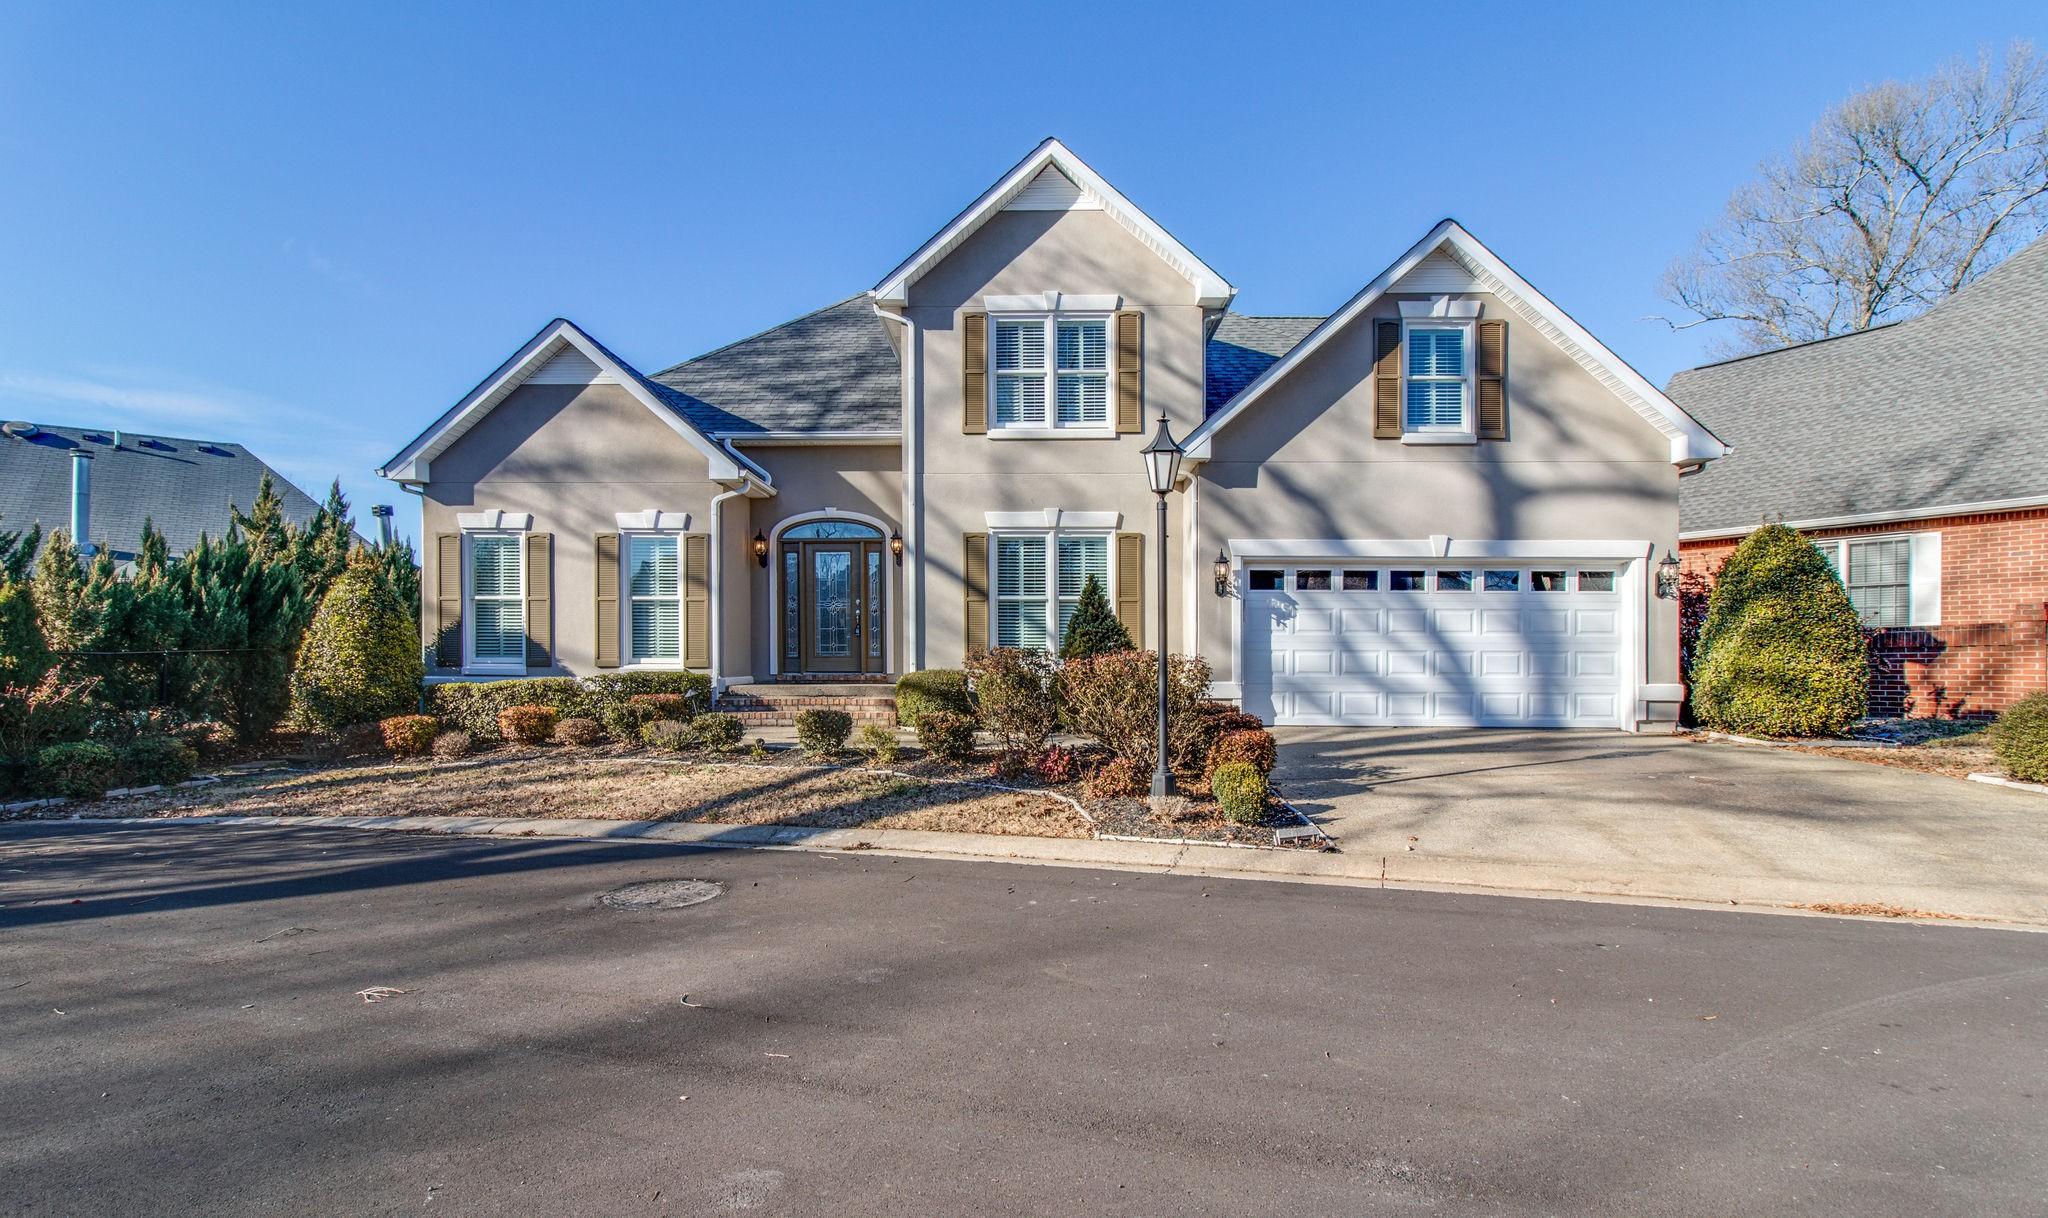 2519 Apache Trl, Murfreesboro, TN 37129 - Murfreesboro, TN real estate listing